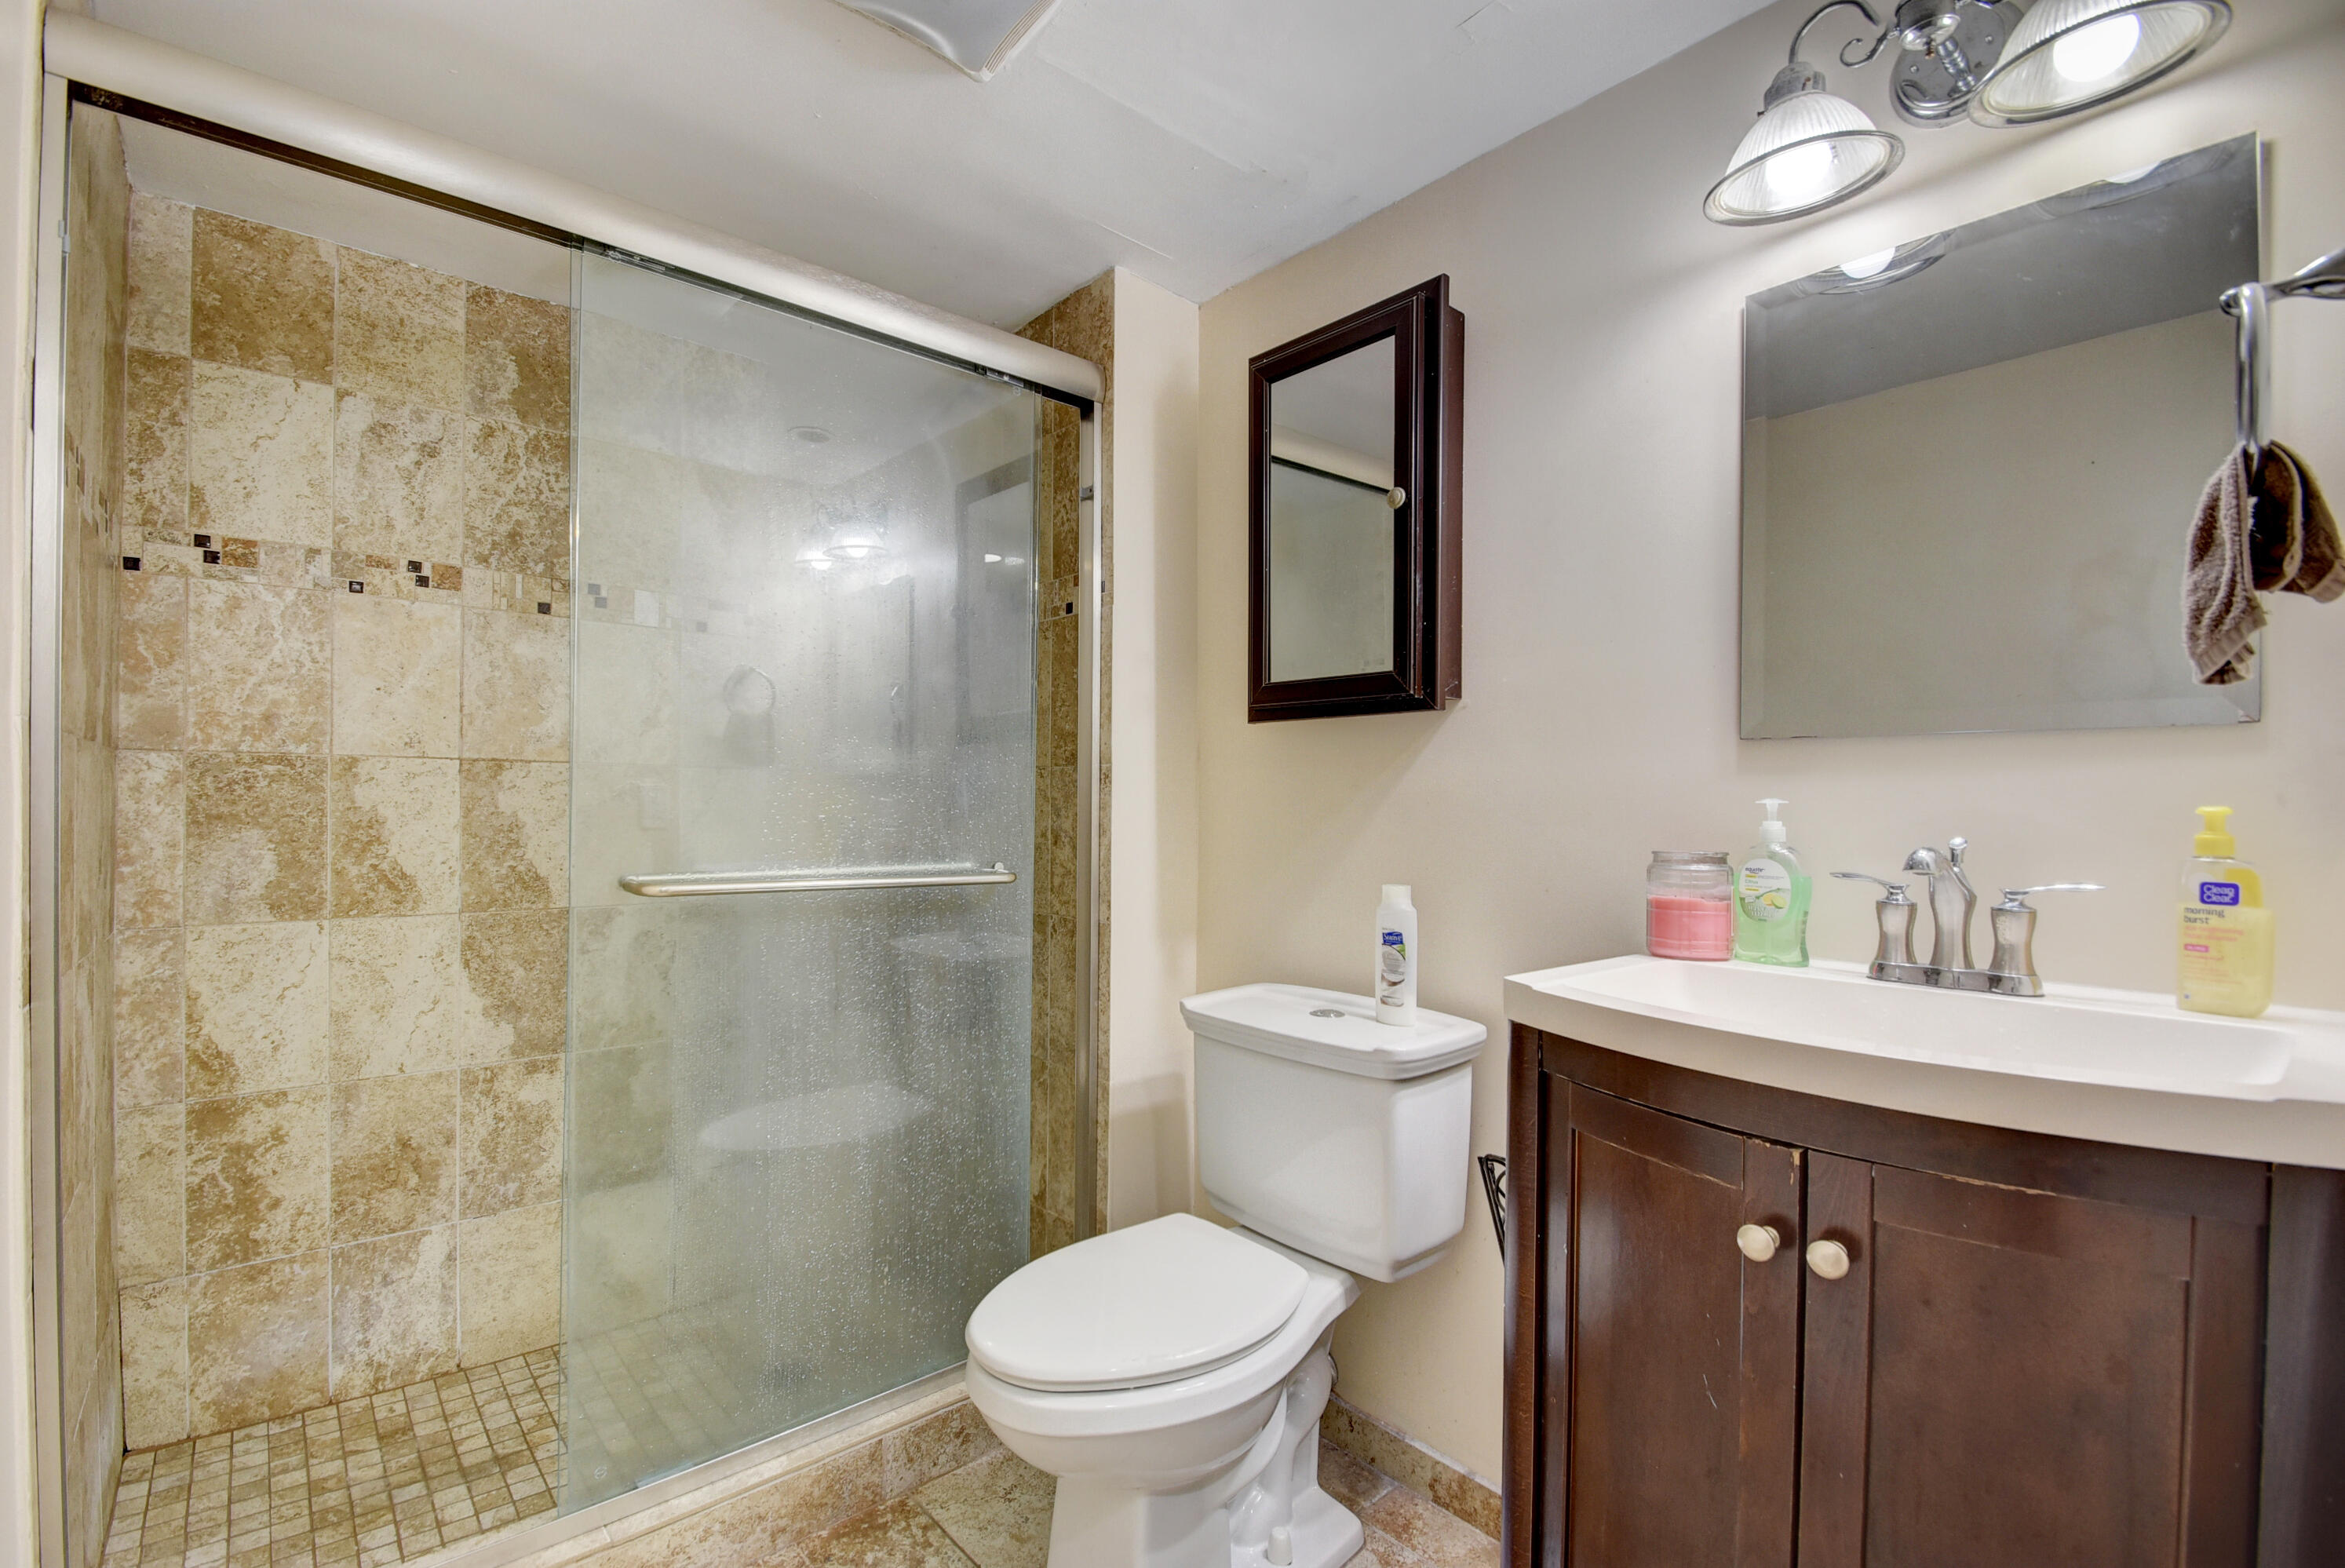 Downstairs 3rd bathroom